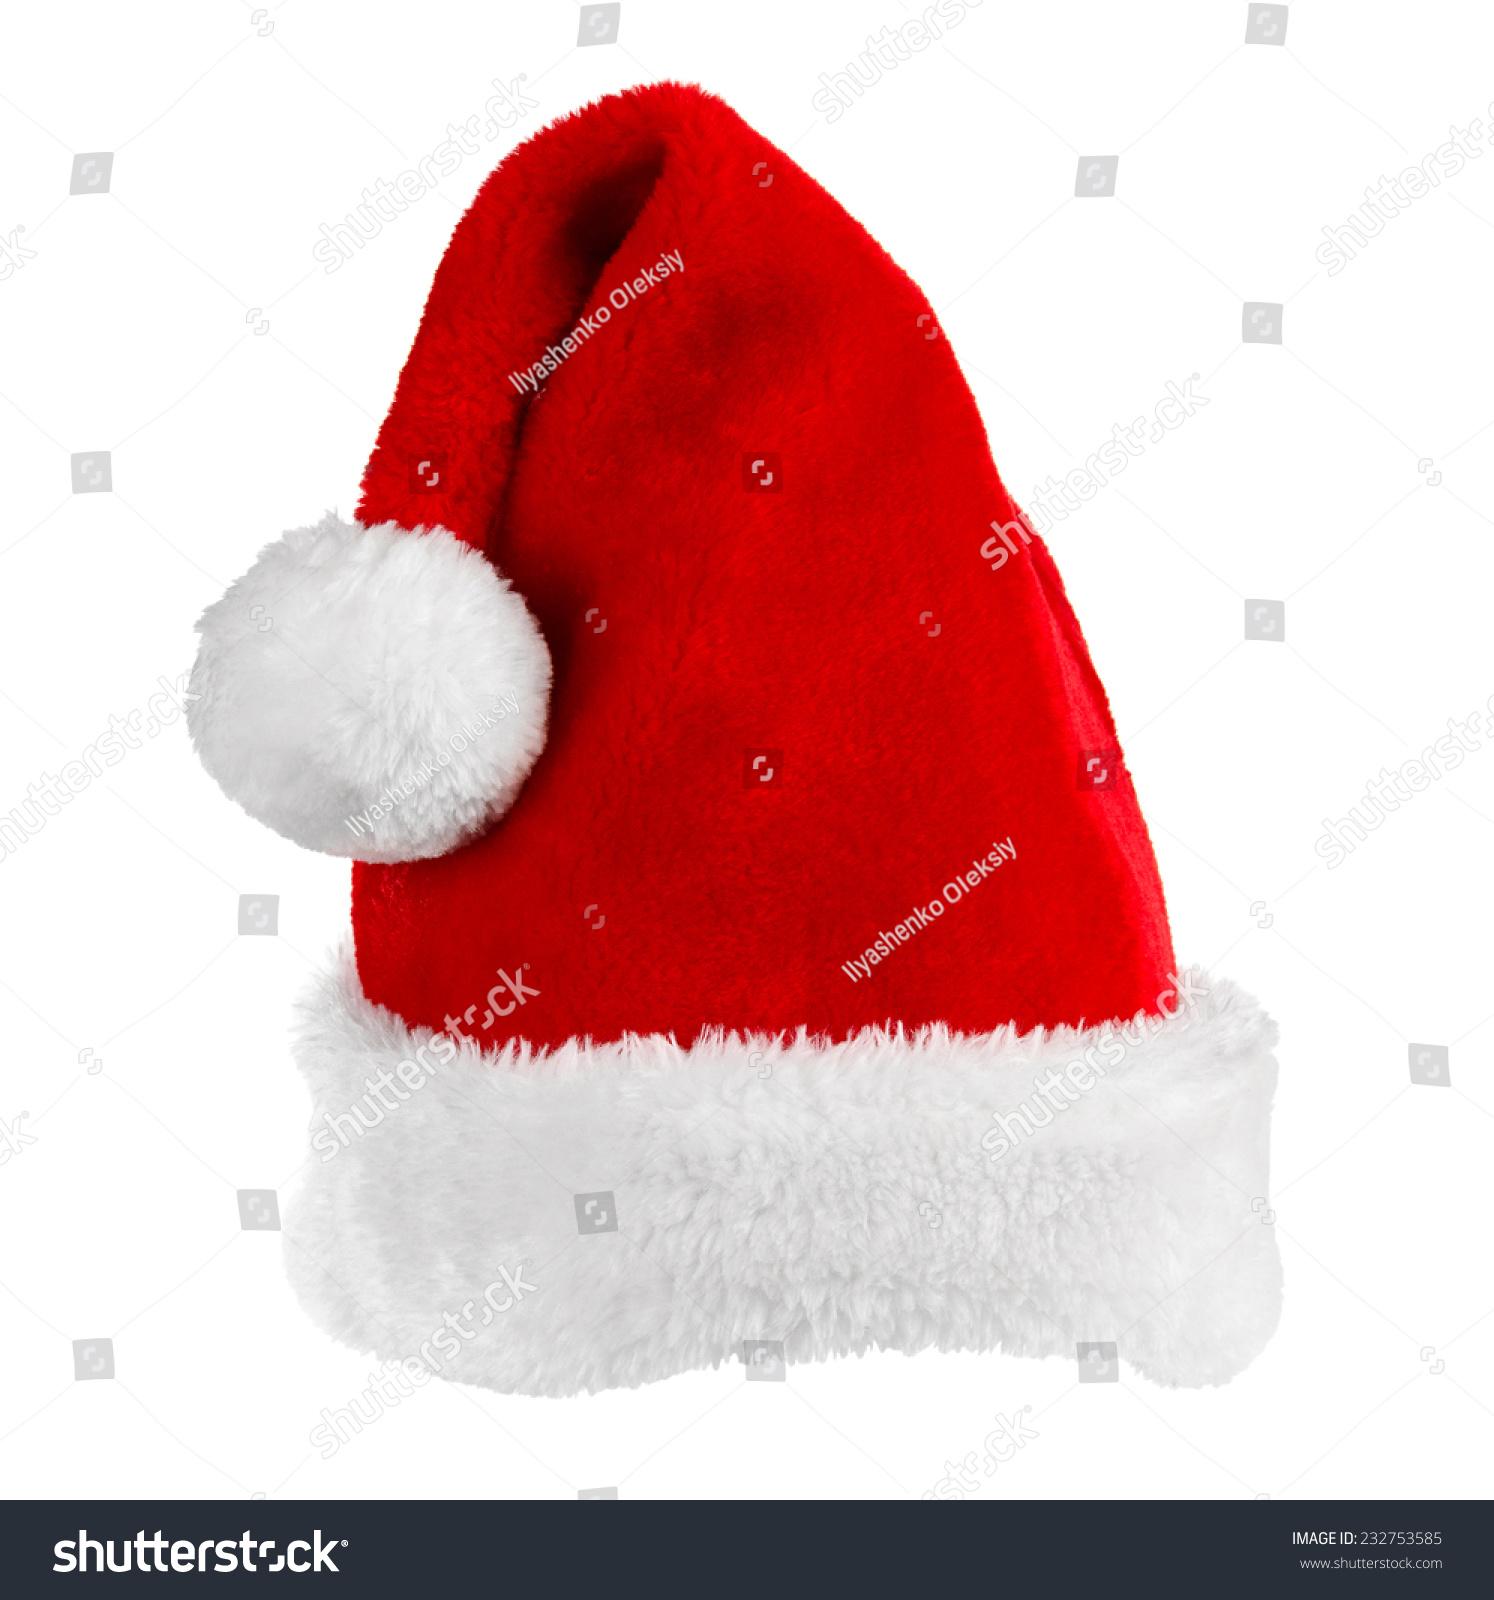 santa claus dating Thomas tolbert has a bushy white beard and ruddy red cheeks that helps him get work as a santa portray santa claus at is dating a married man.